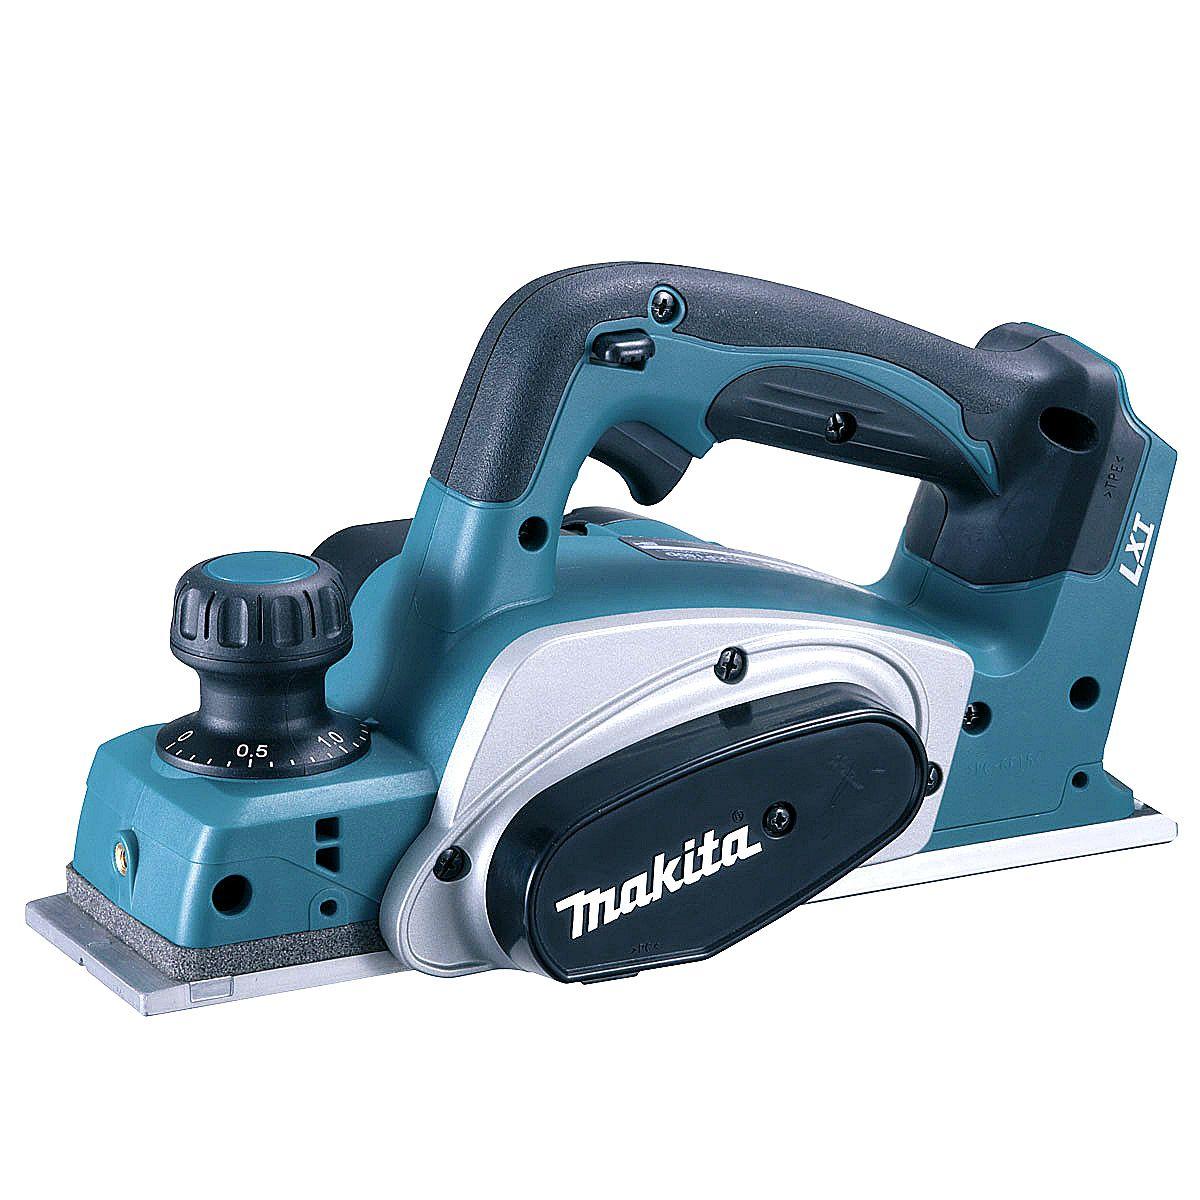 Makita DKP180Z akkus falcgyalu géptest (36 hónap garancia)